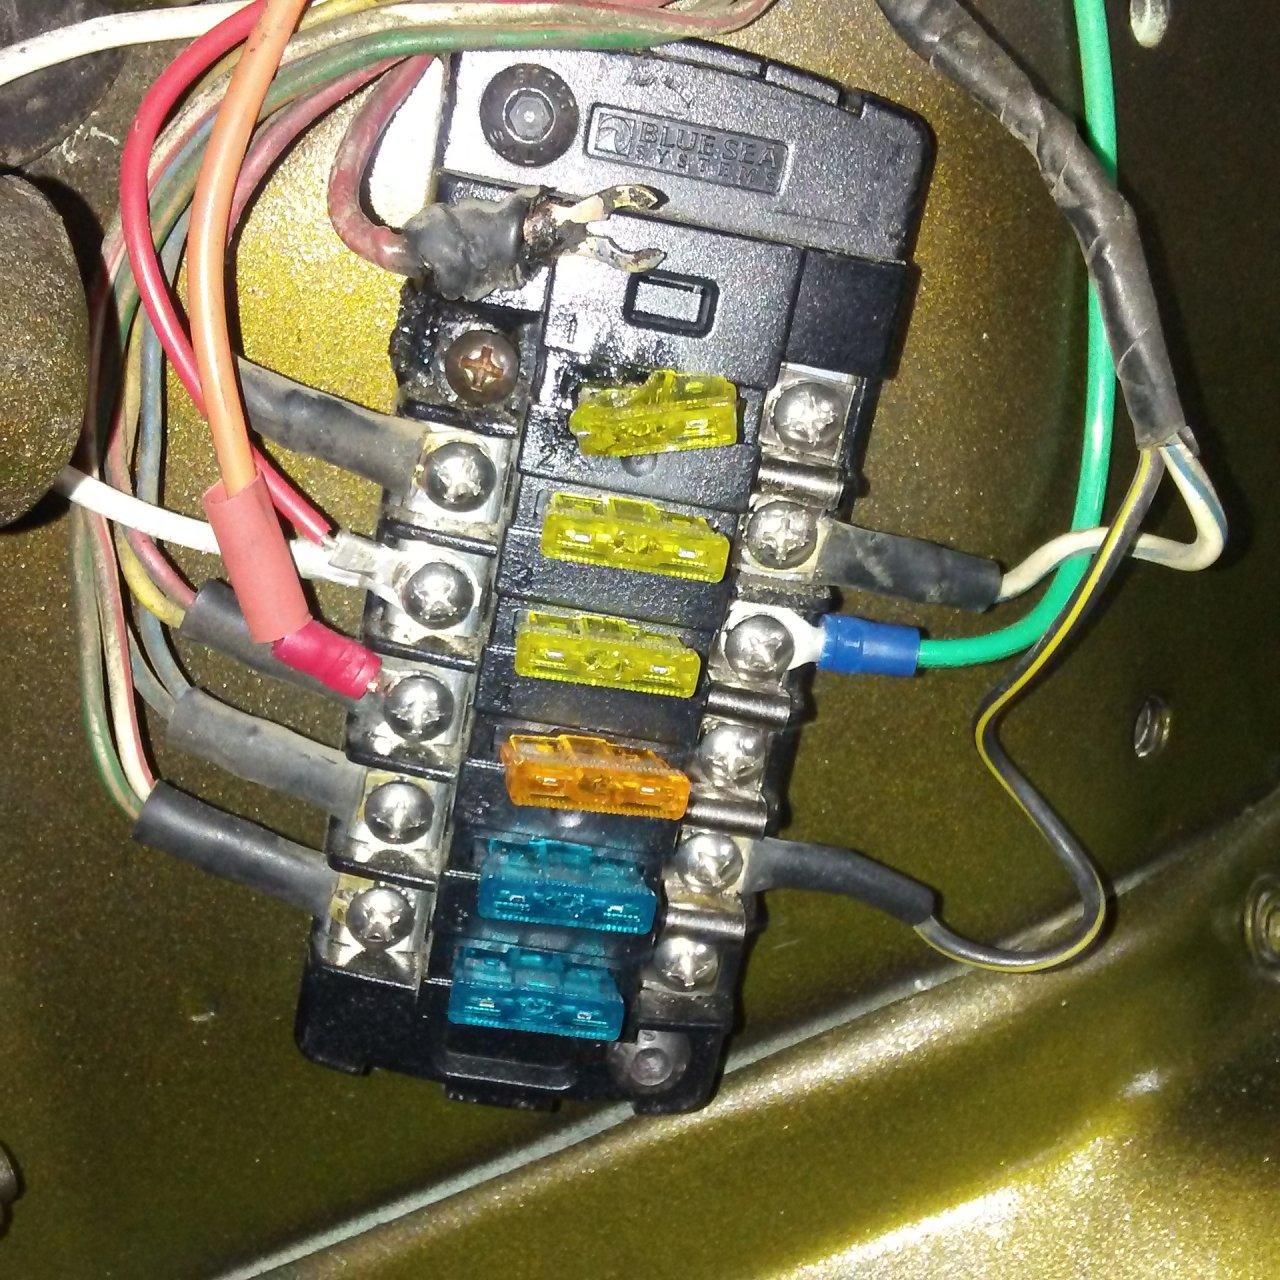 Galaxy Fuse Box Melted : Lights circuit fuse block meltdown ih mud forum